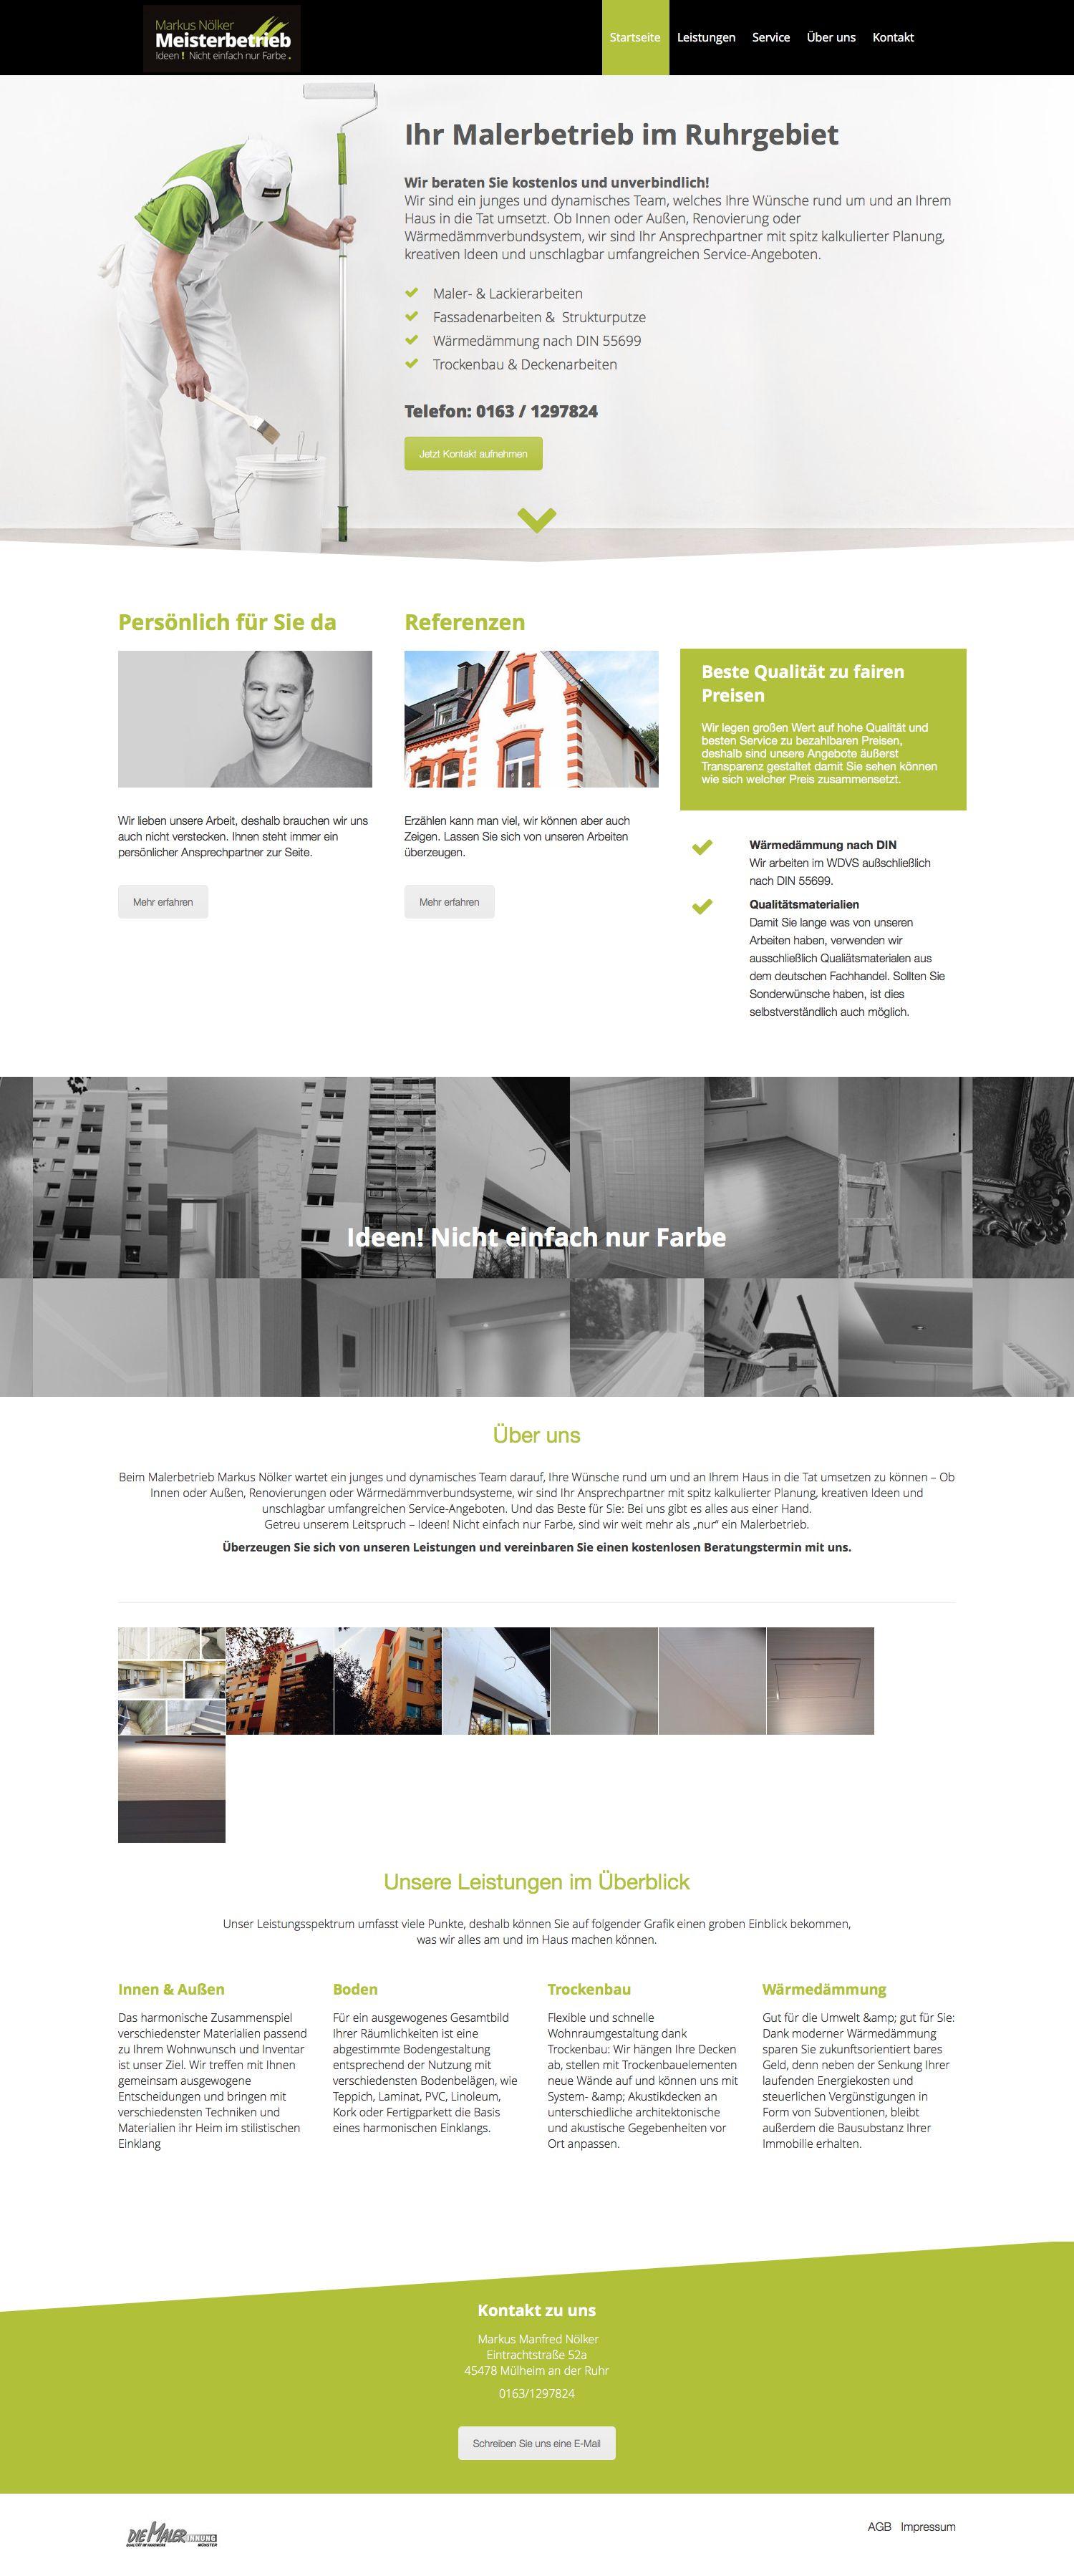 Webdesign Malerbetrieb   Webdesign   Pinterest